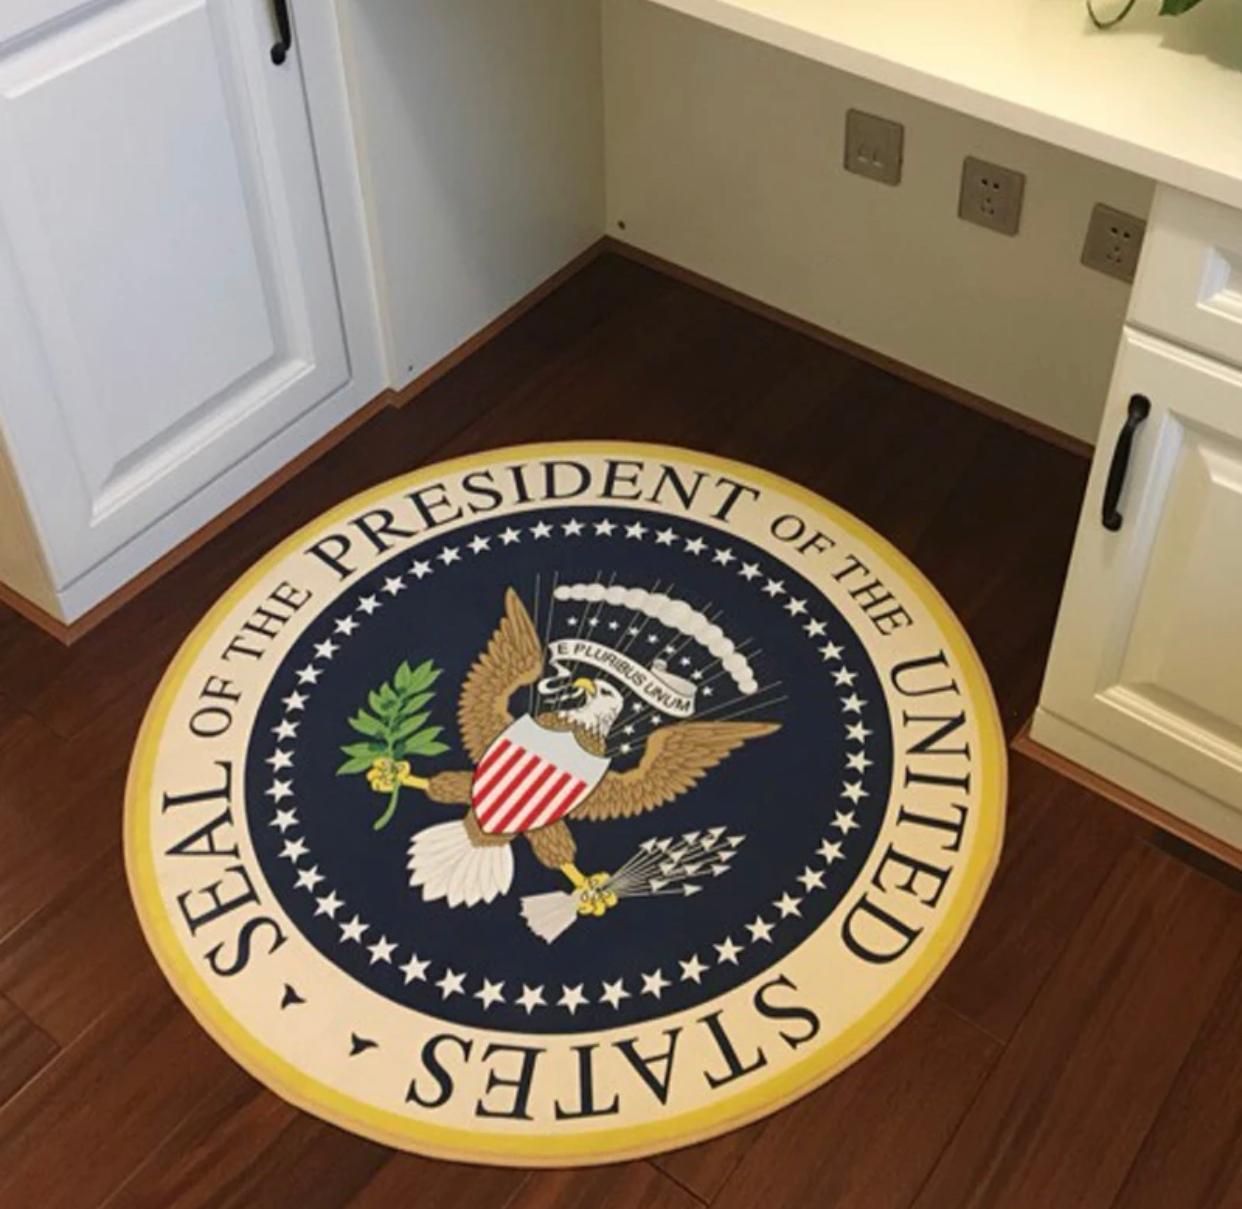 Tapete Decorativo Geek Selo do Presidente dos Estados Unidos Seal Of The President Of The United State 120 cm - EVALI